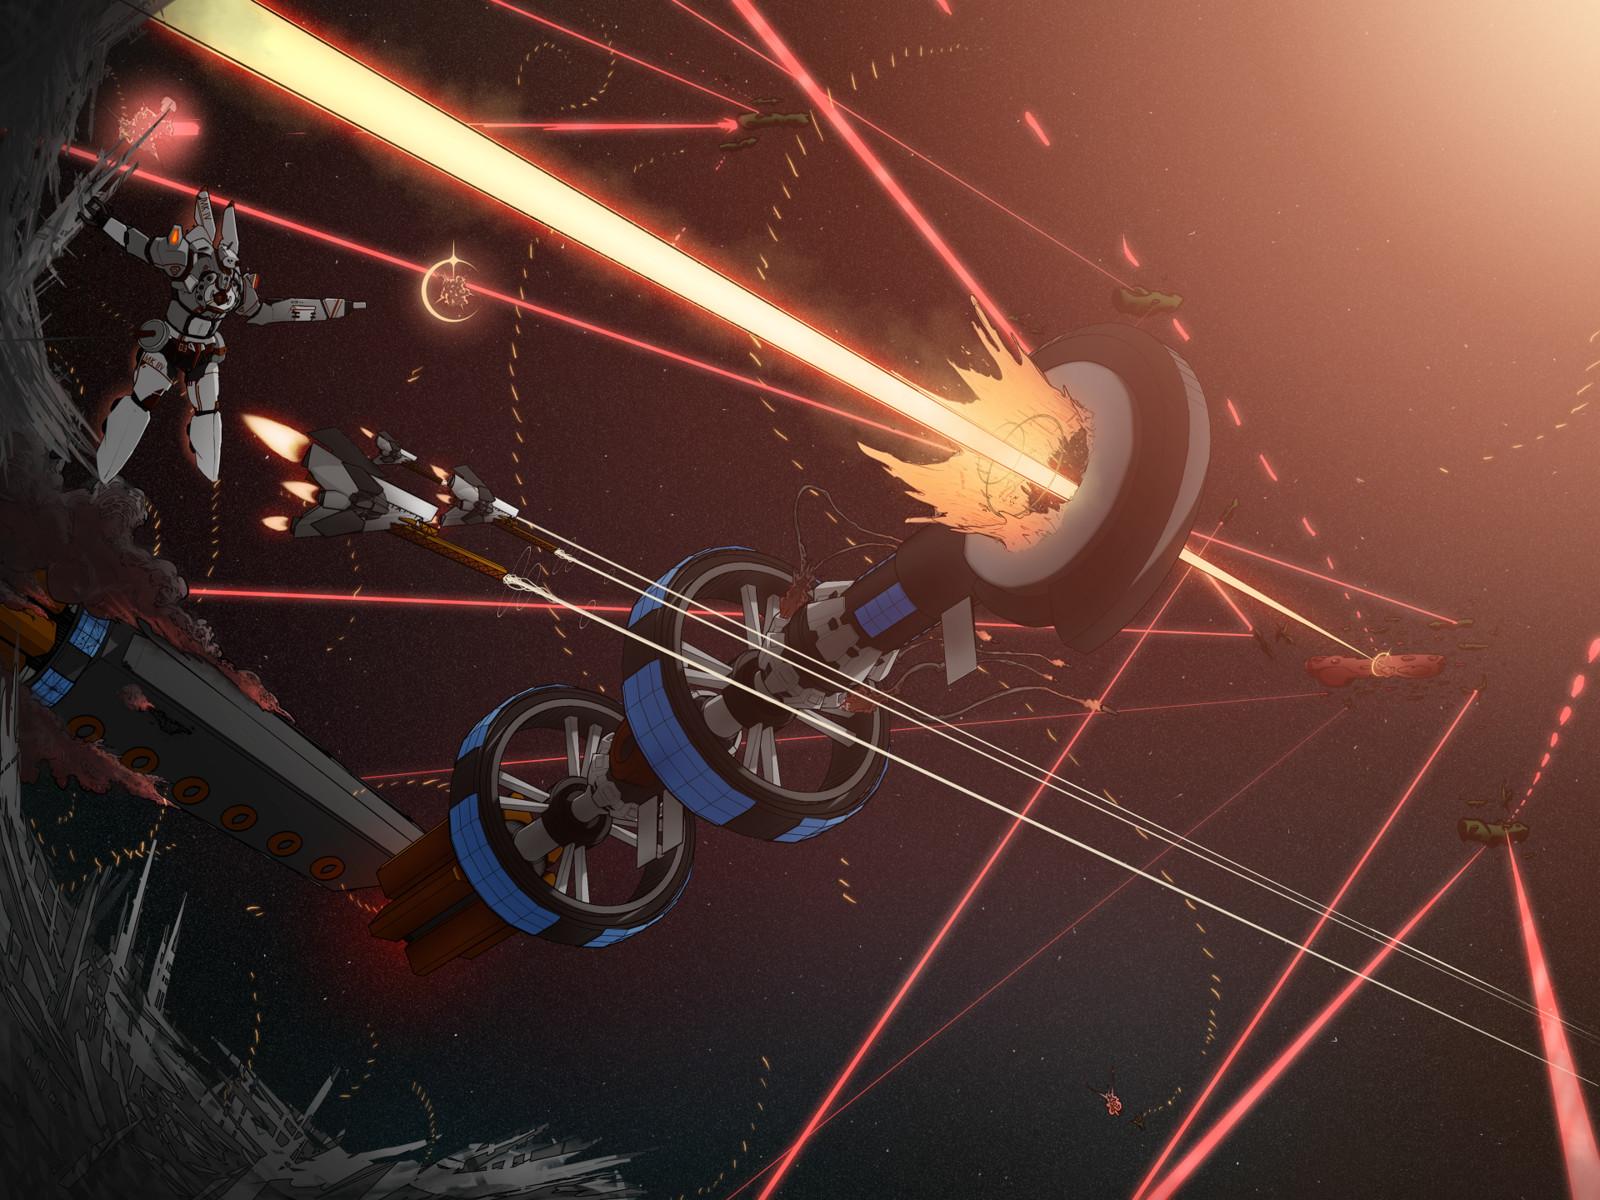 Battle of Scirocco